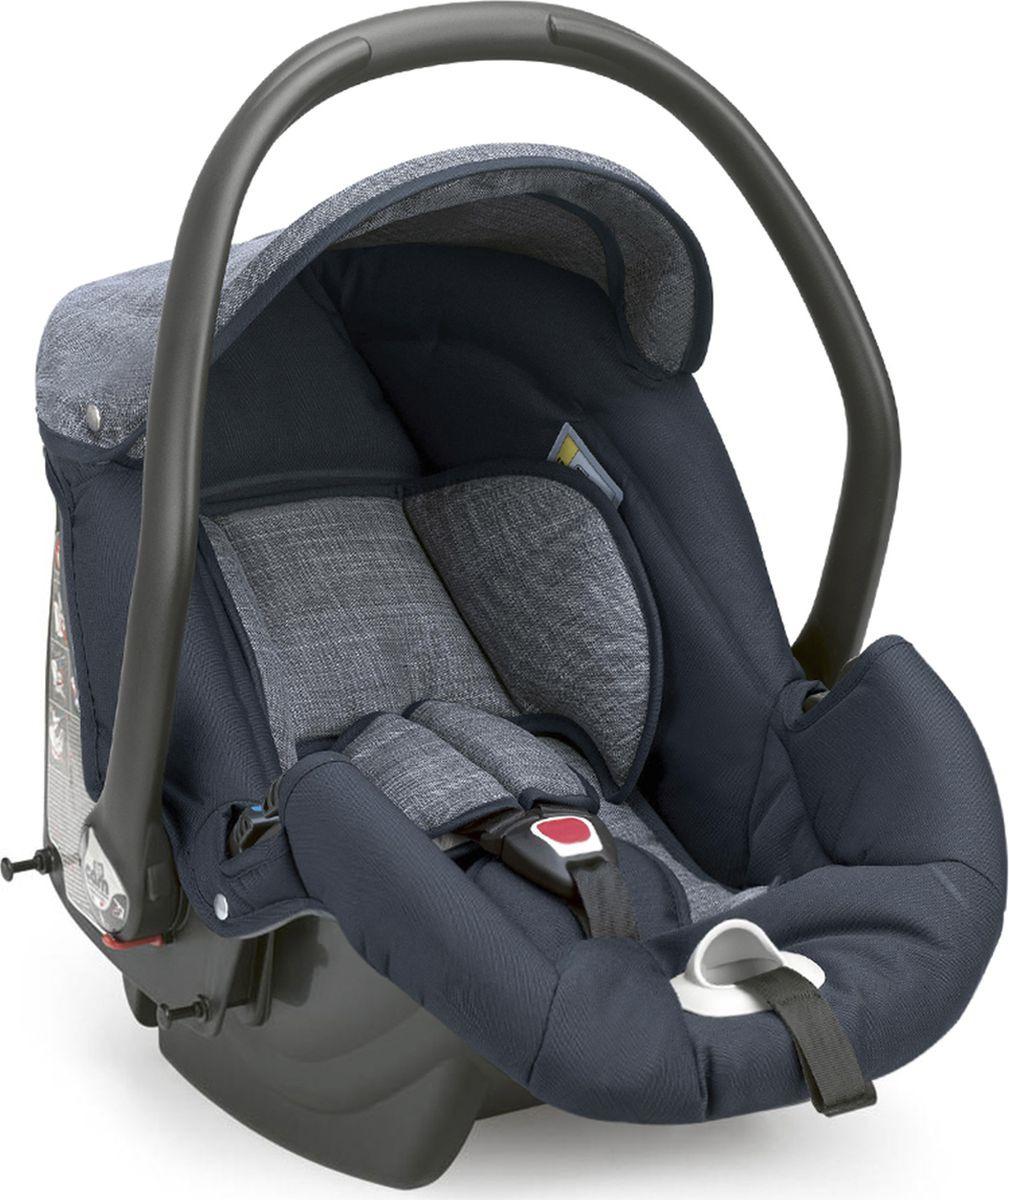 Автокресло Cam Area Zero+, до 13 кг, S138/625, серый, синий цена